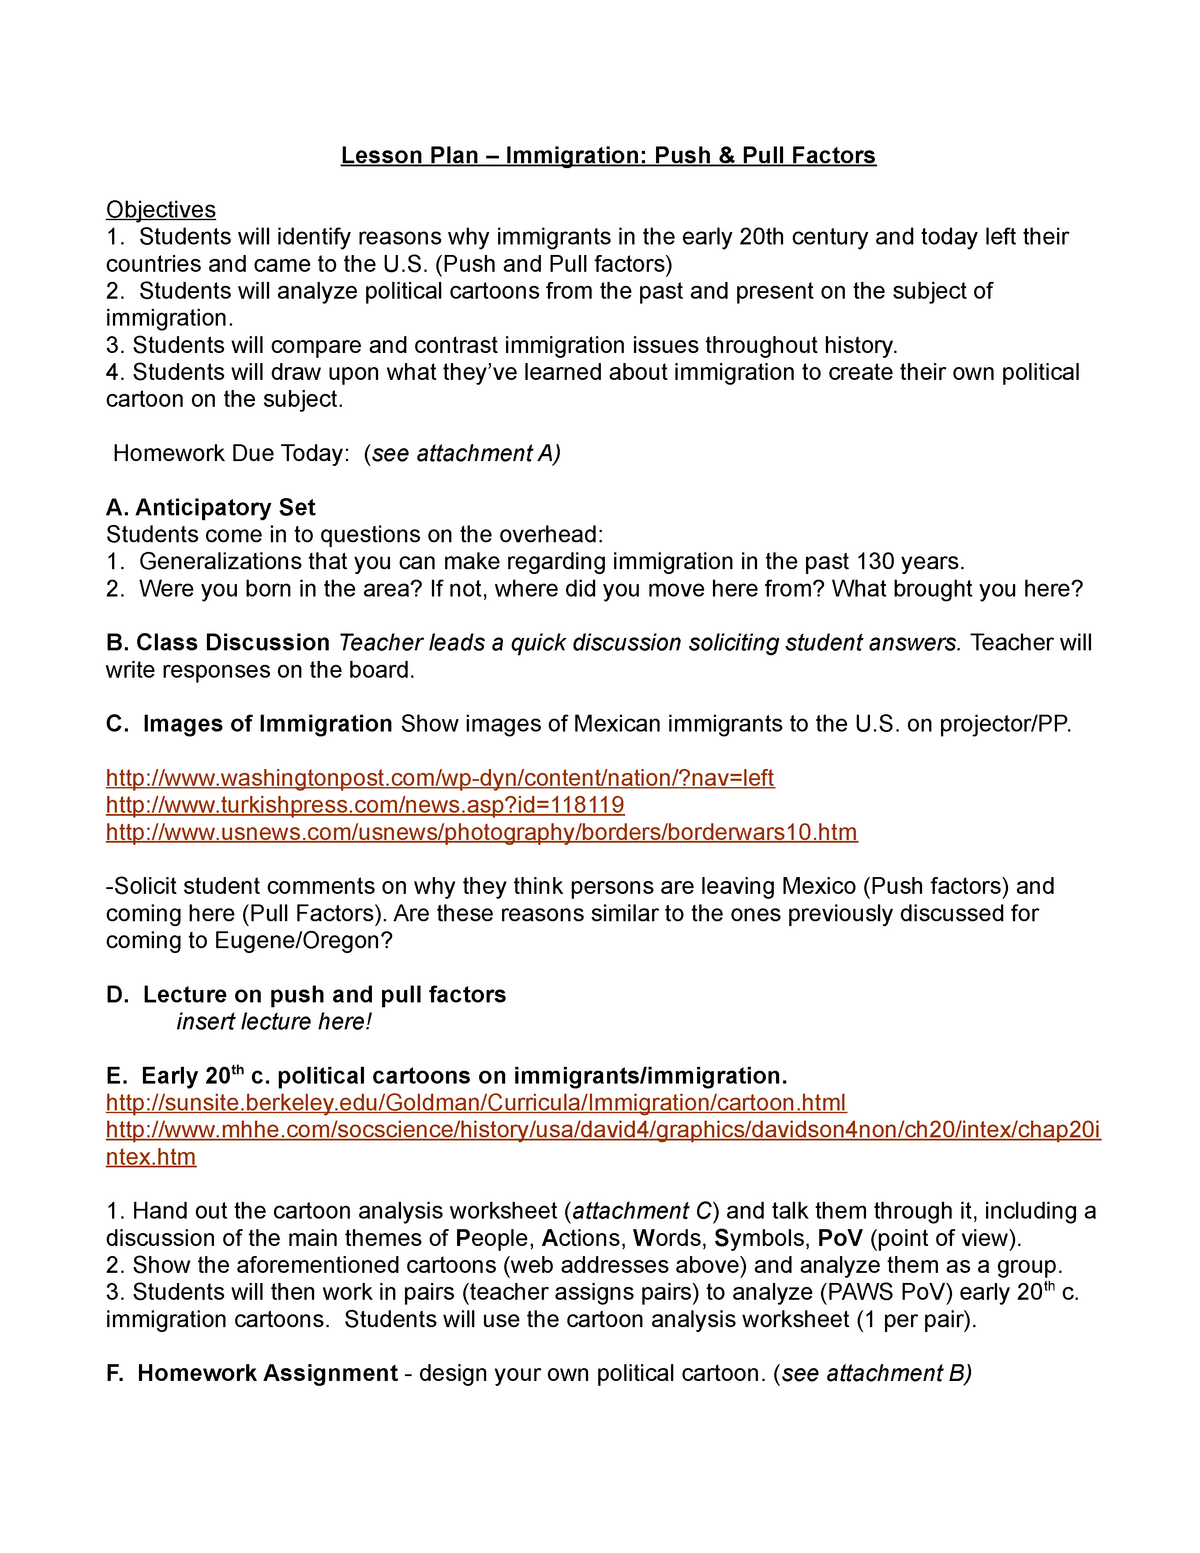 Analyze The Political Cartoon Worksheet Answers